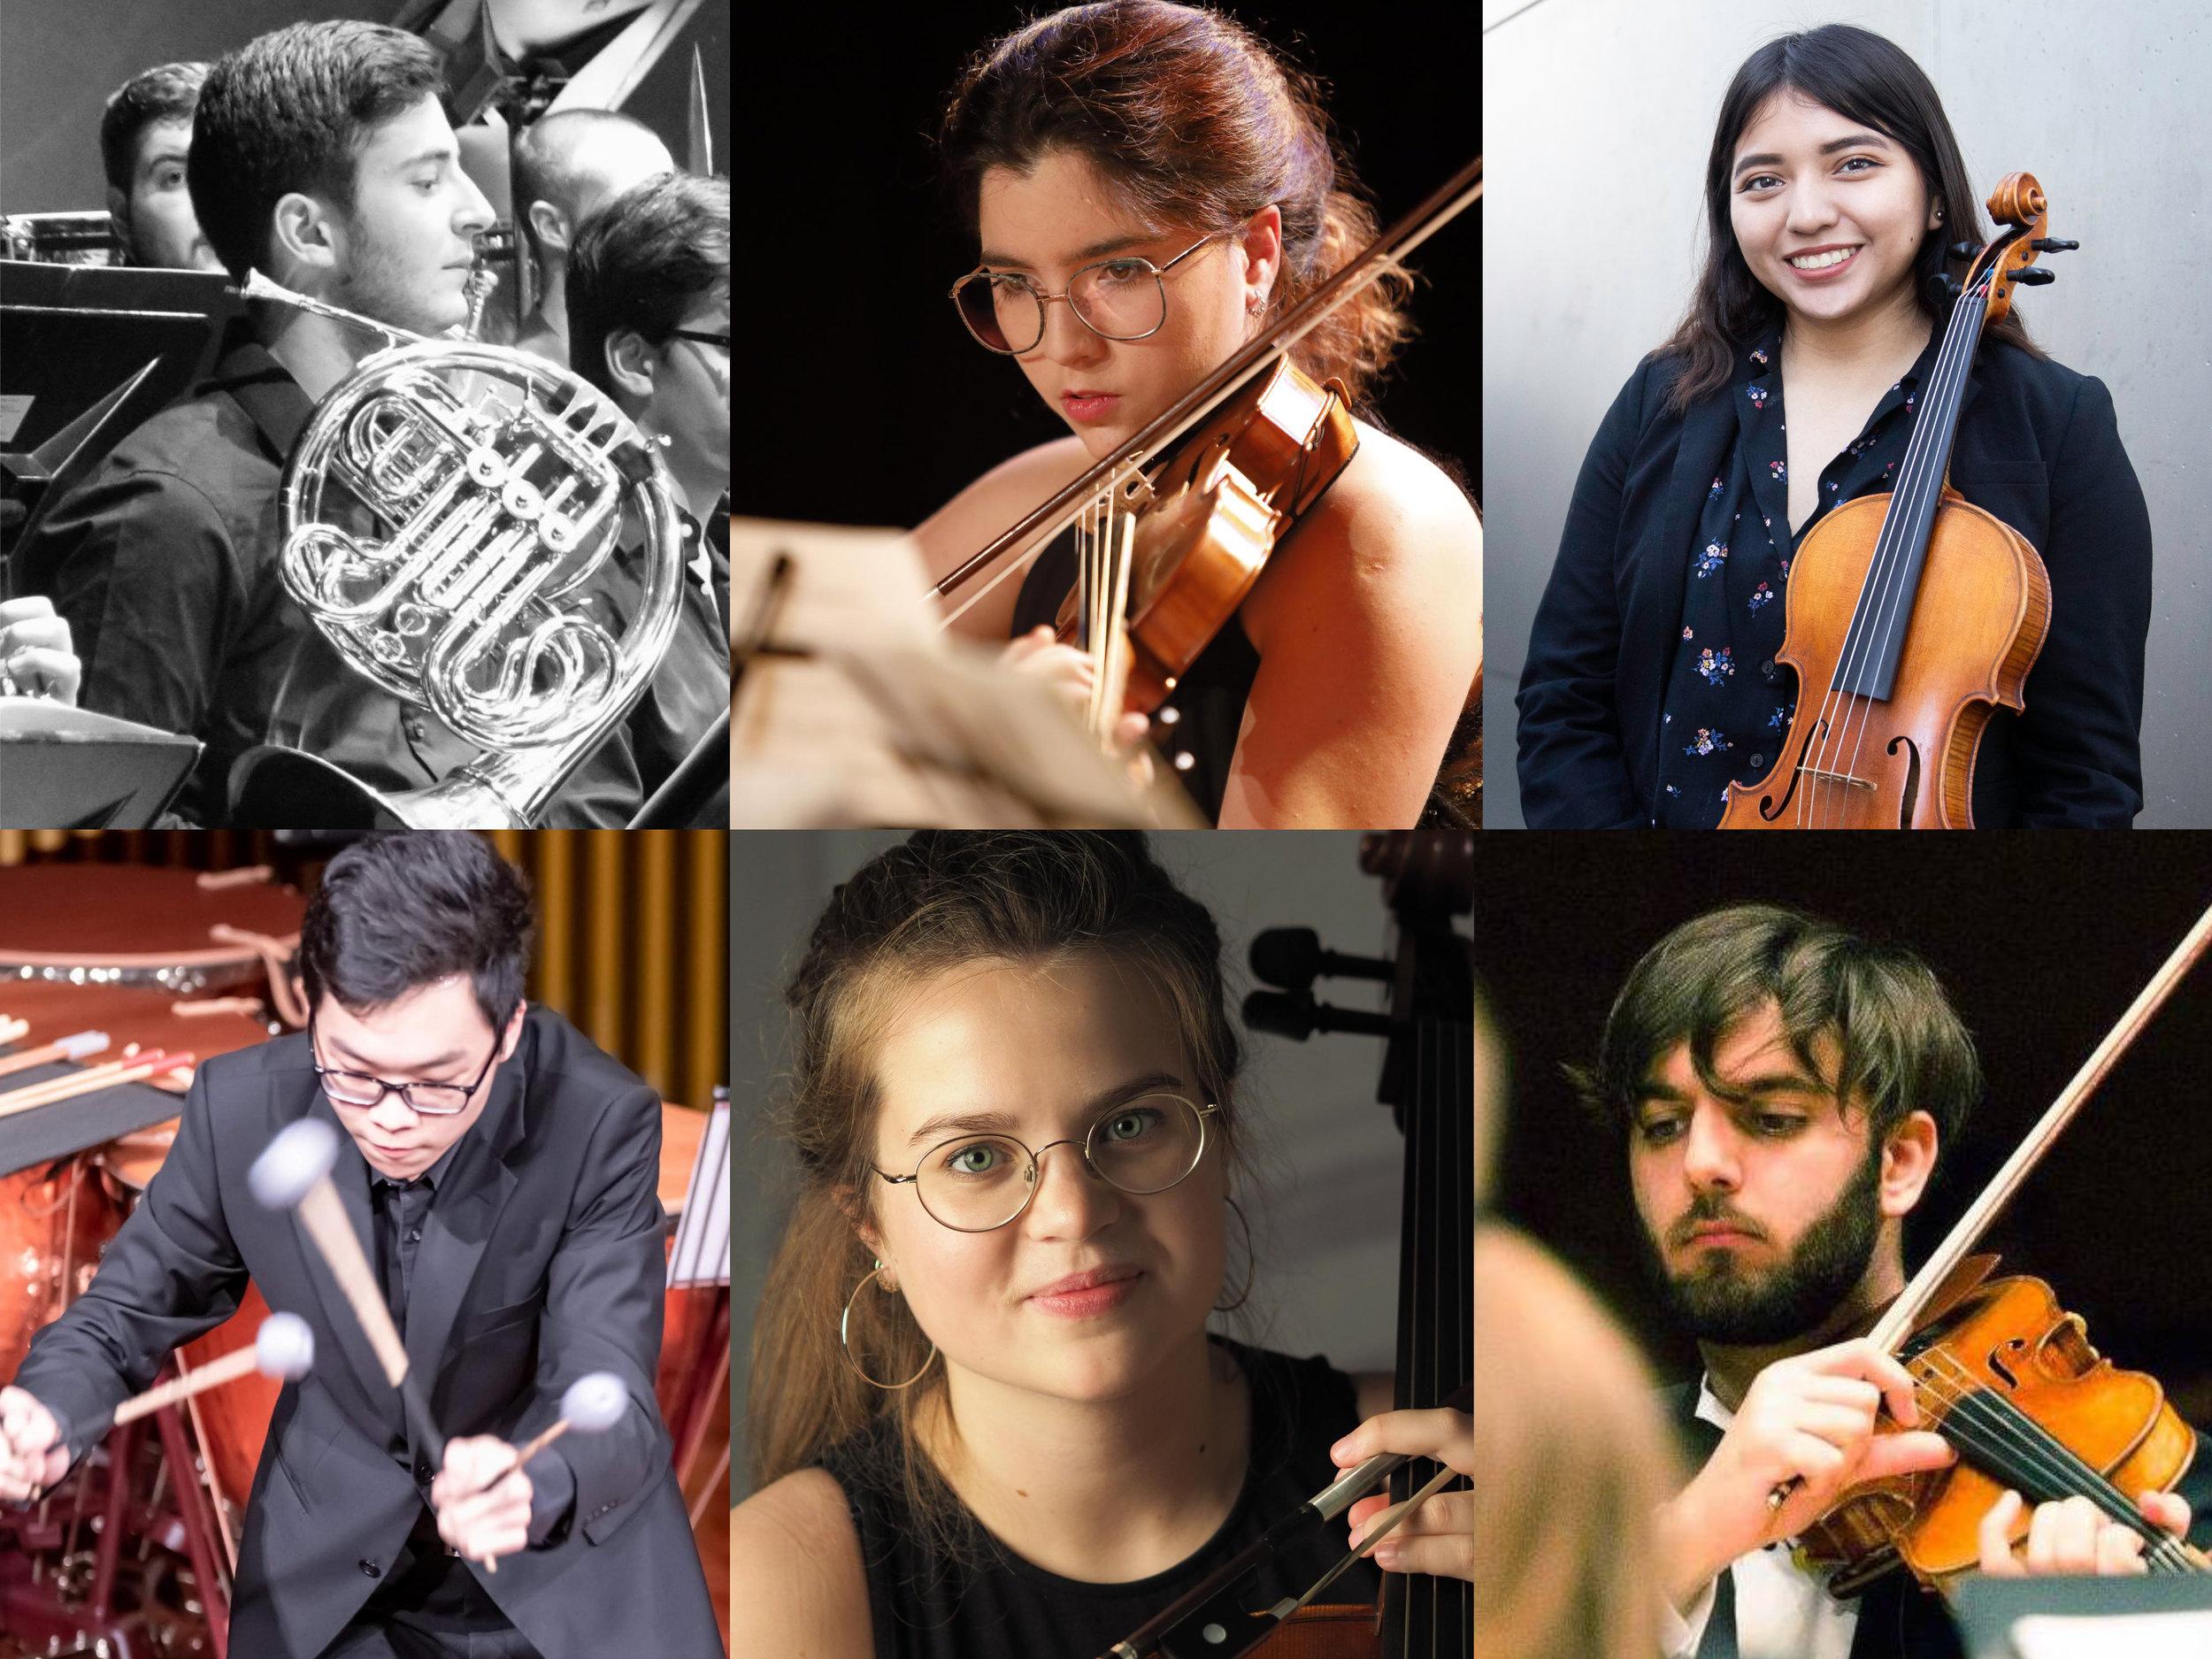 Clockwise: Antonio Lasheras, Montserrat Seras, Samantha Rosas, David Fonseca, Rut Mateu, Michael Yeung